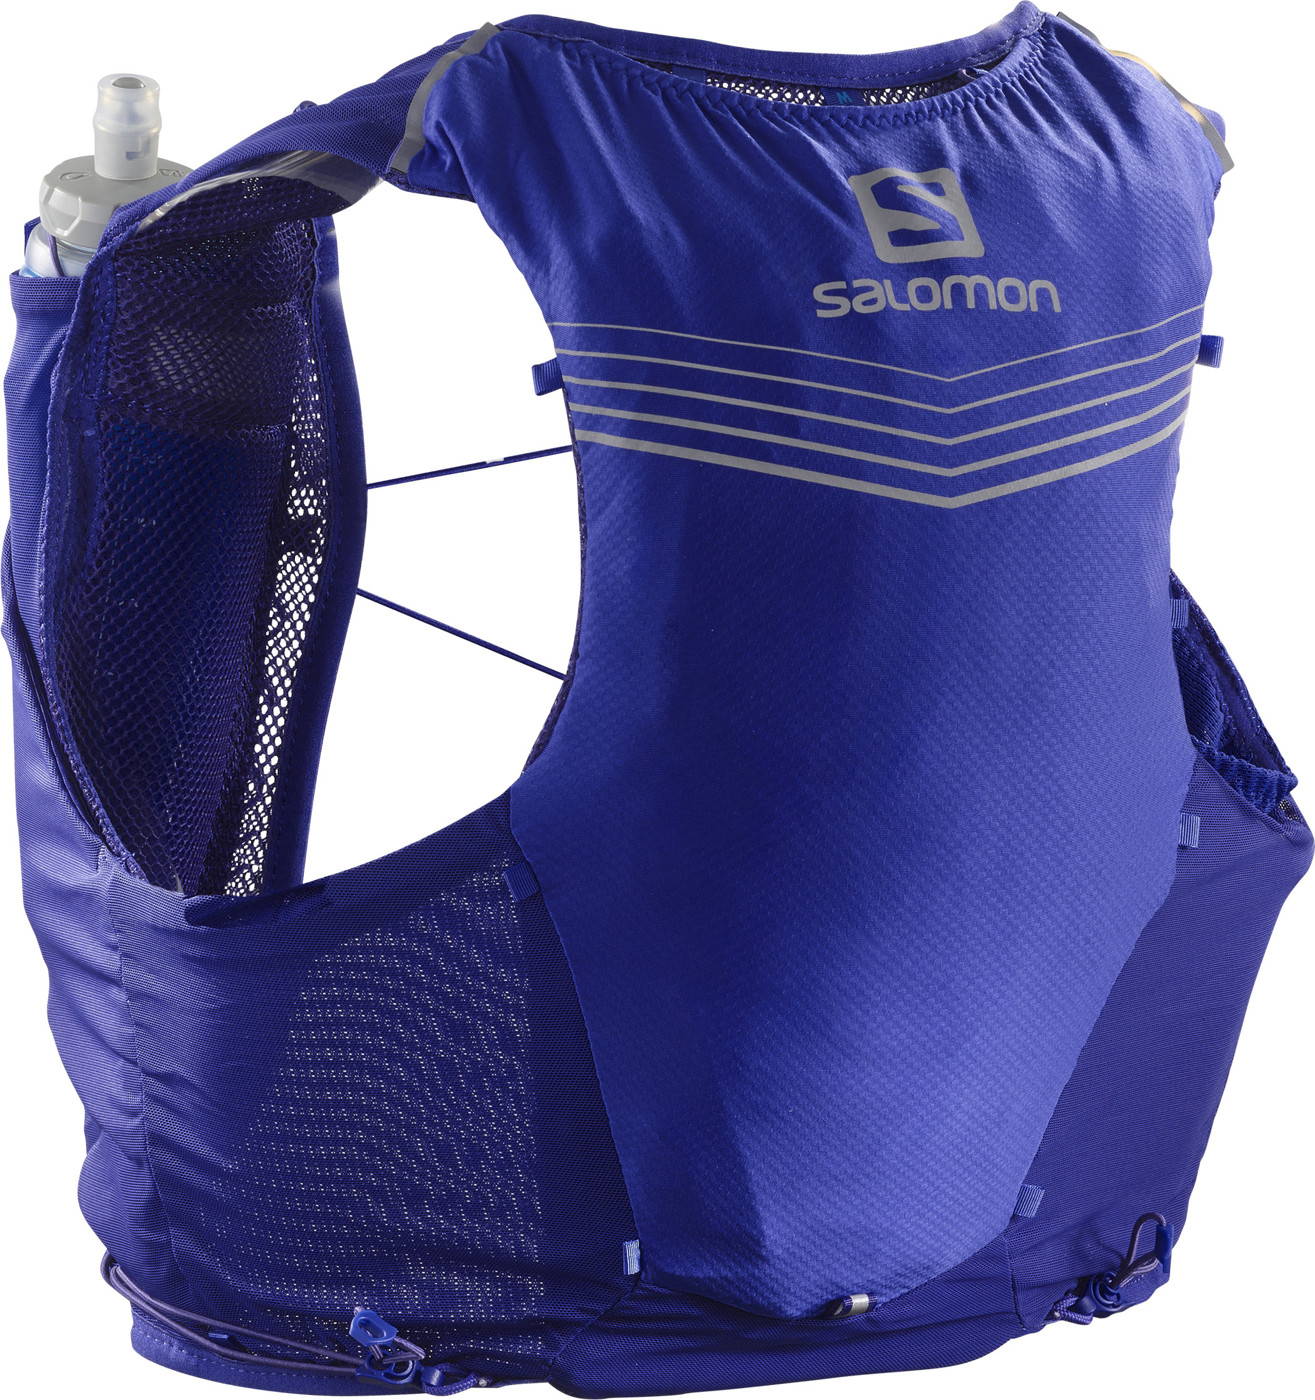 SALOMON ADV SKIN 5 SET CLEMATIS BLUE/Ebony M